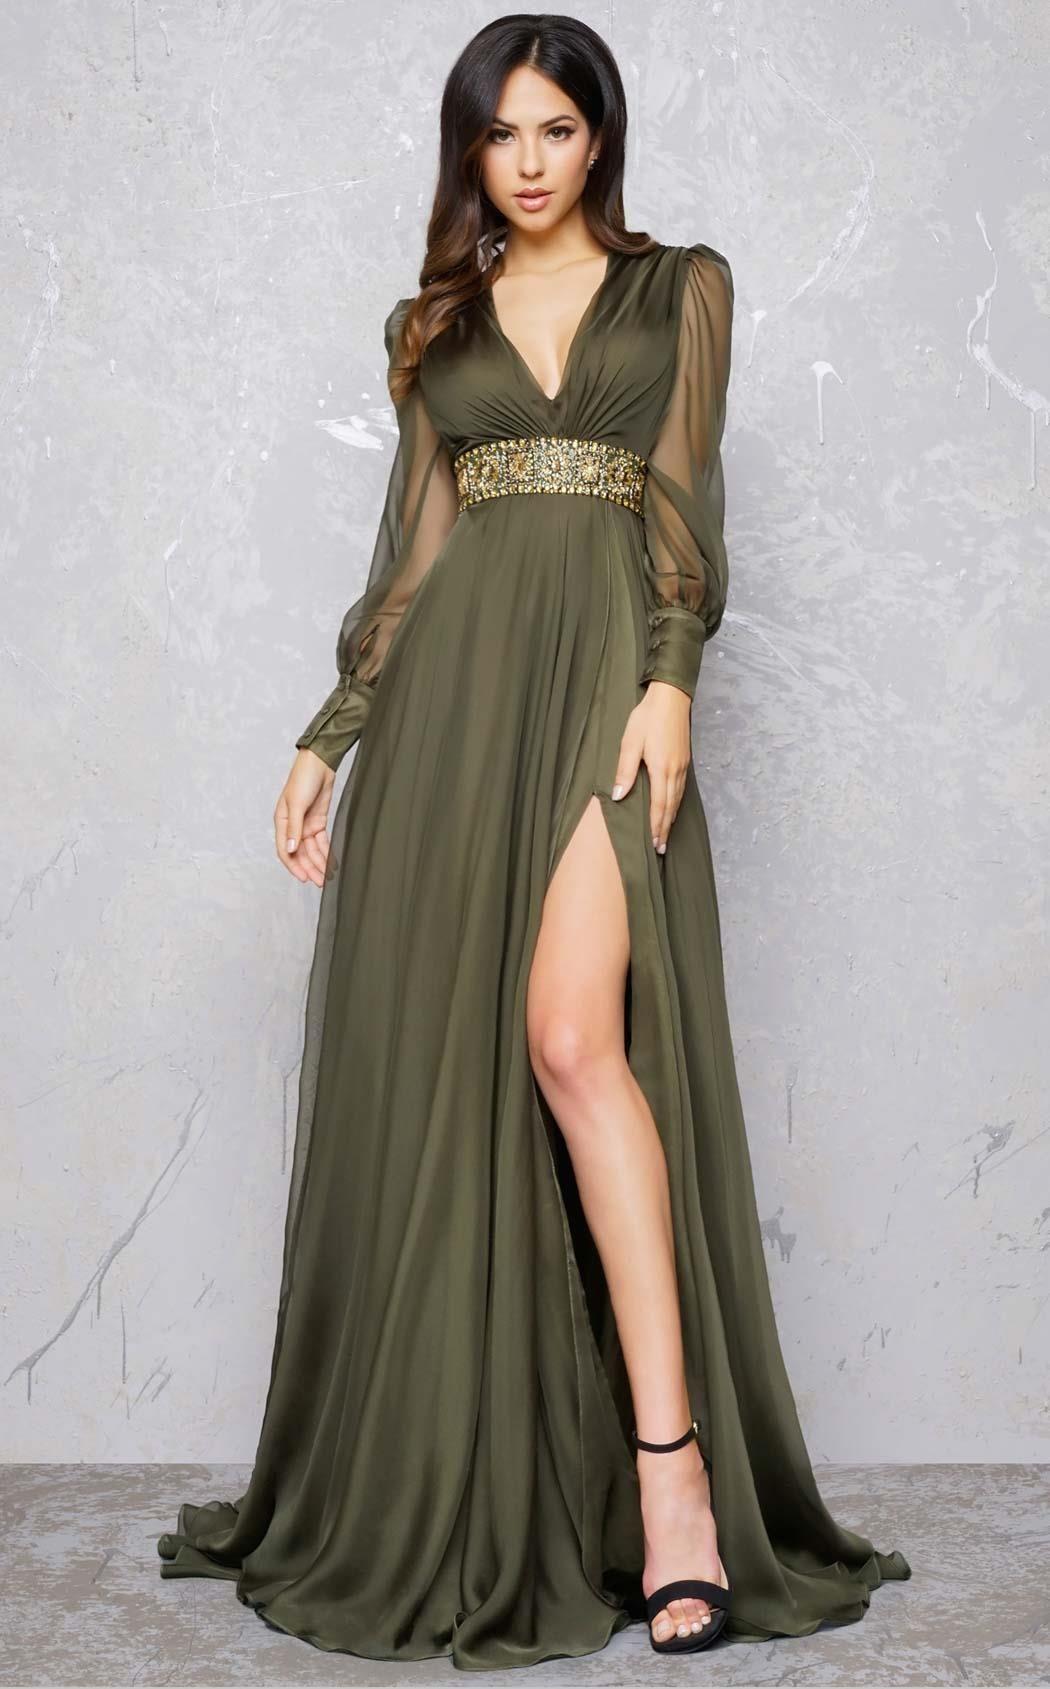 Vintage style dresses s s s and s roupas pinterest